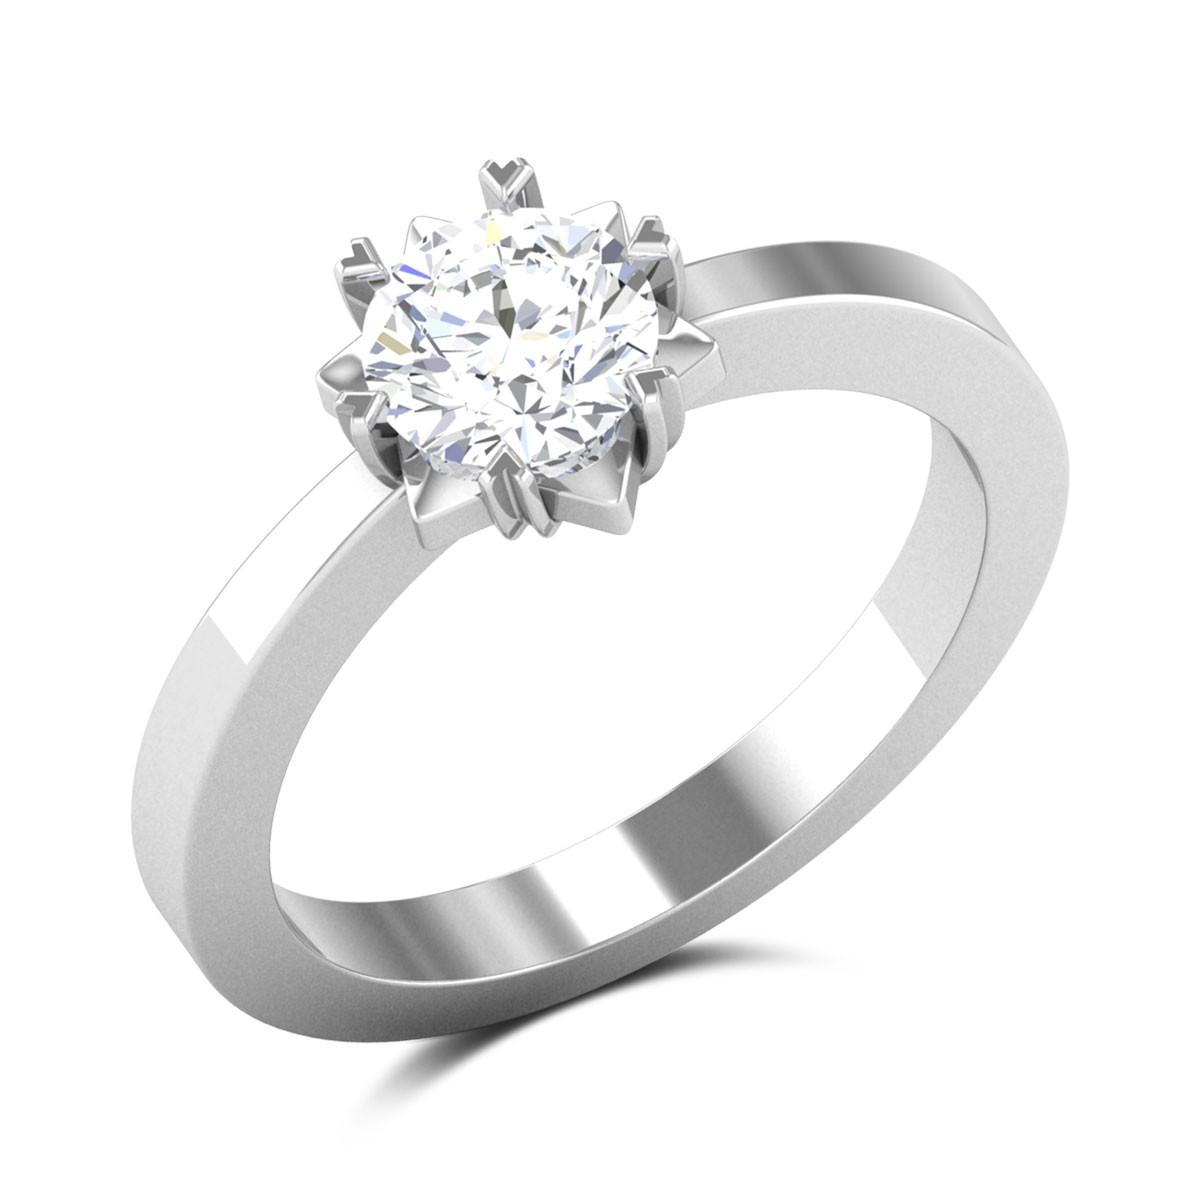 Lemuel Star Solitaire Ring